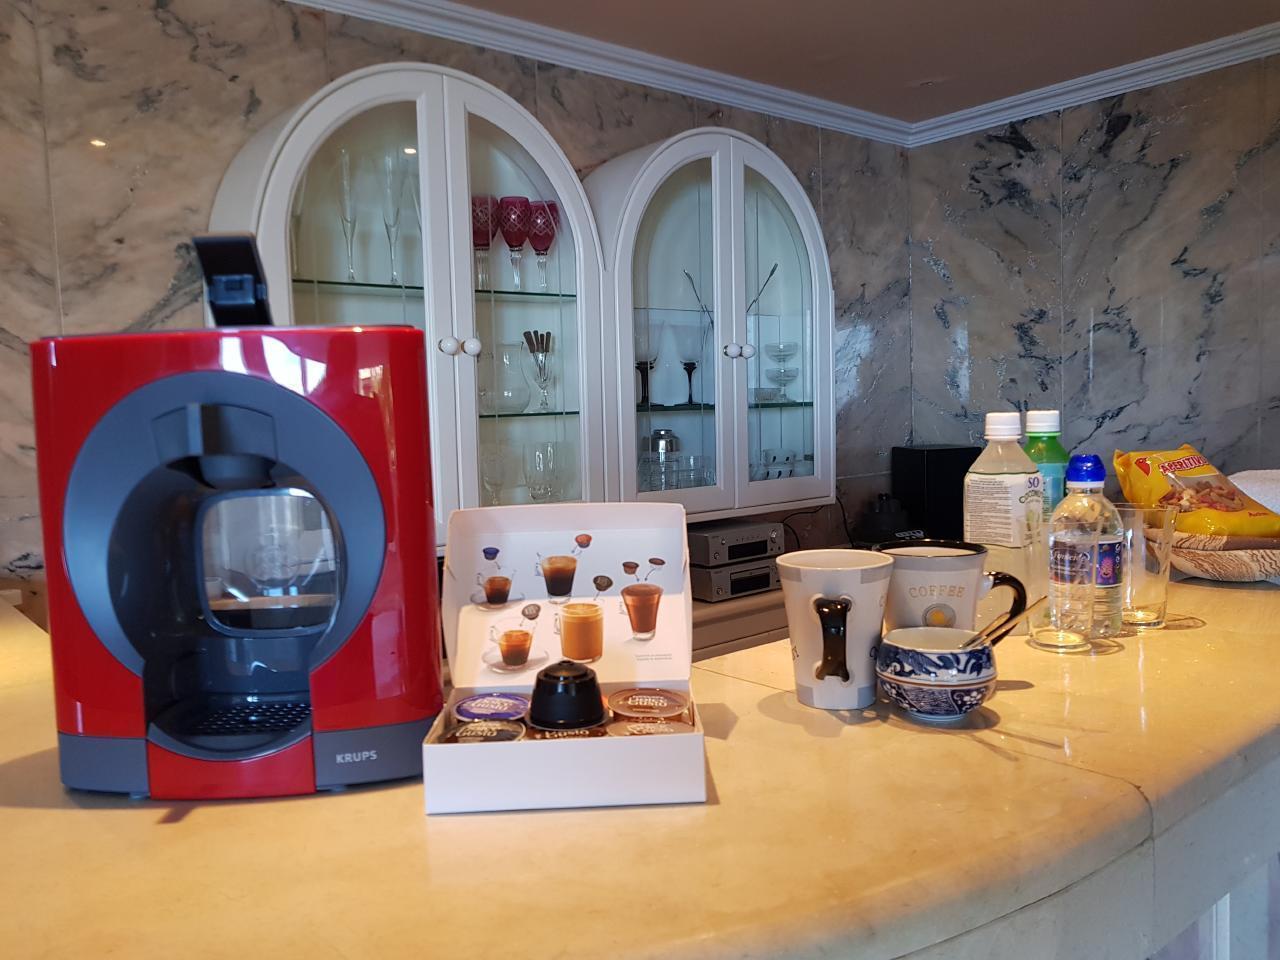 Appartement de vacances Villa Larnia Familien Apartment   * Urlaub für Körper, Geist und Seele * (2529406), El Sauzal, Ténérife, Iles Canaries, Espagne, image 40